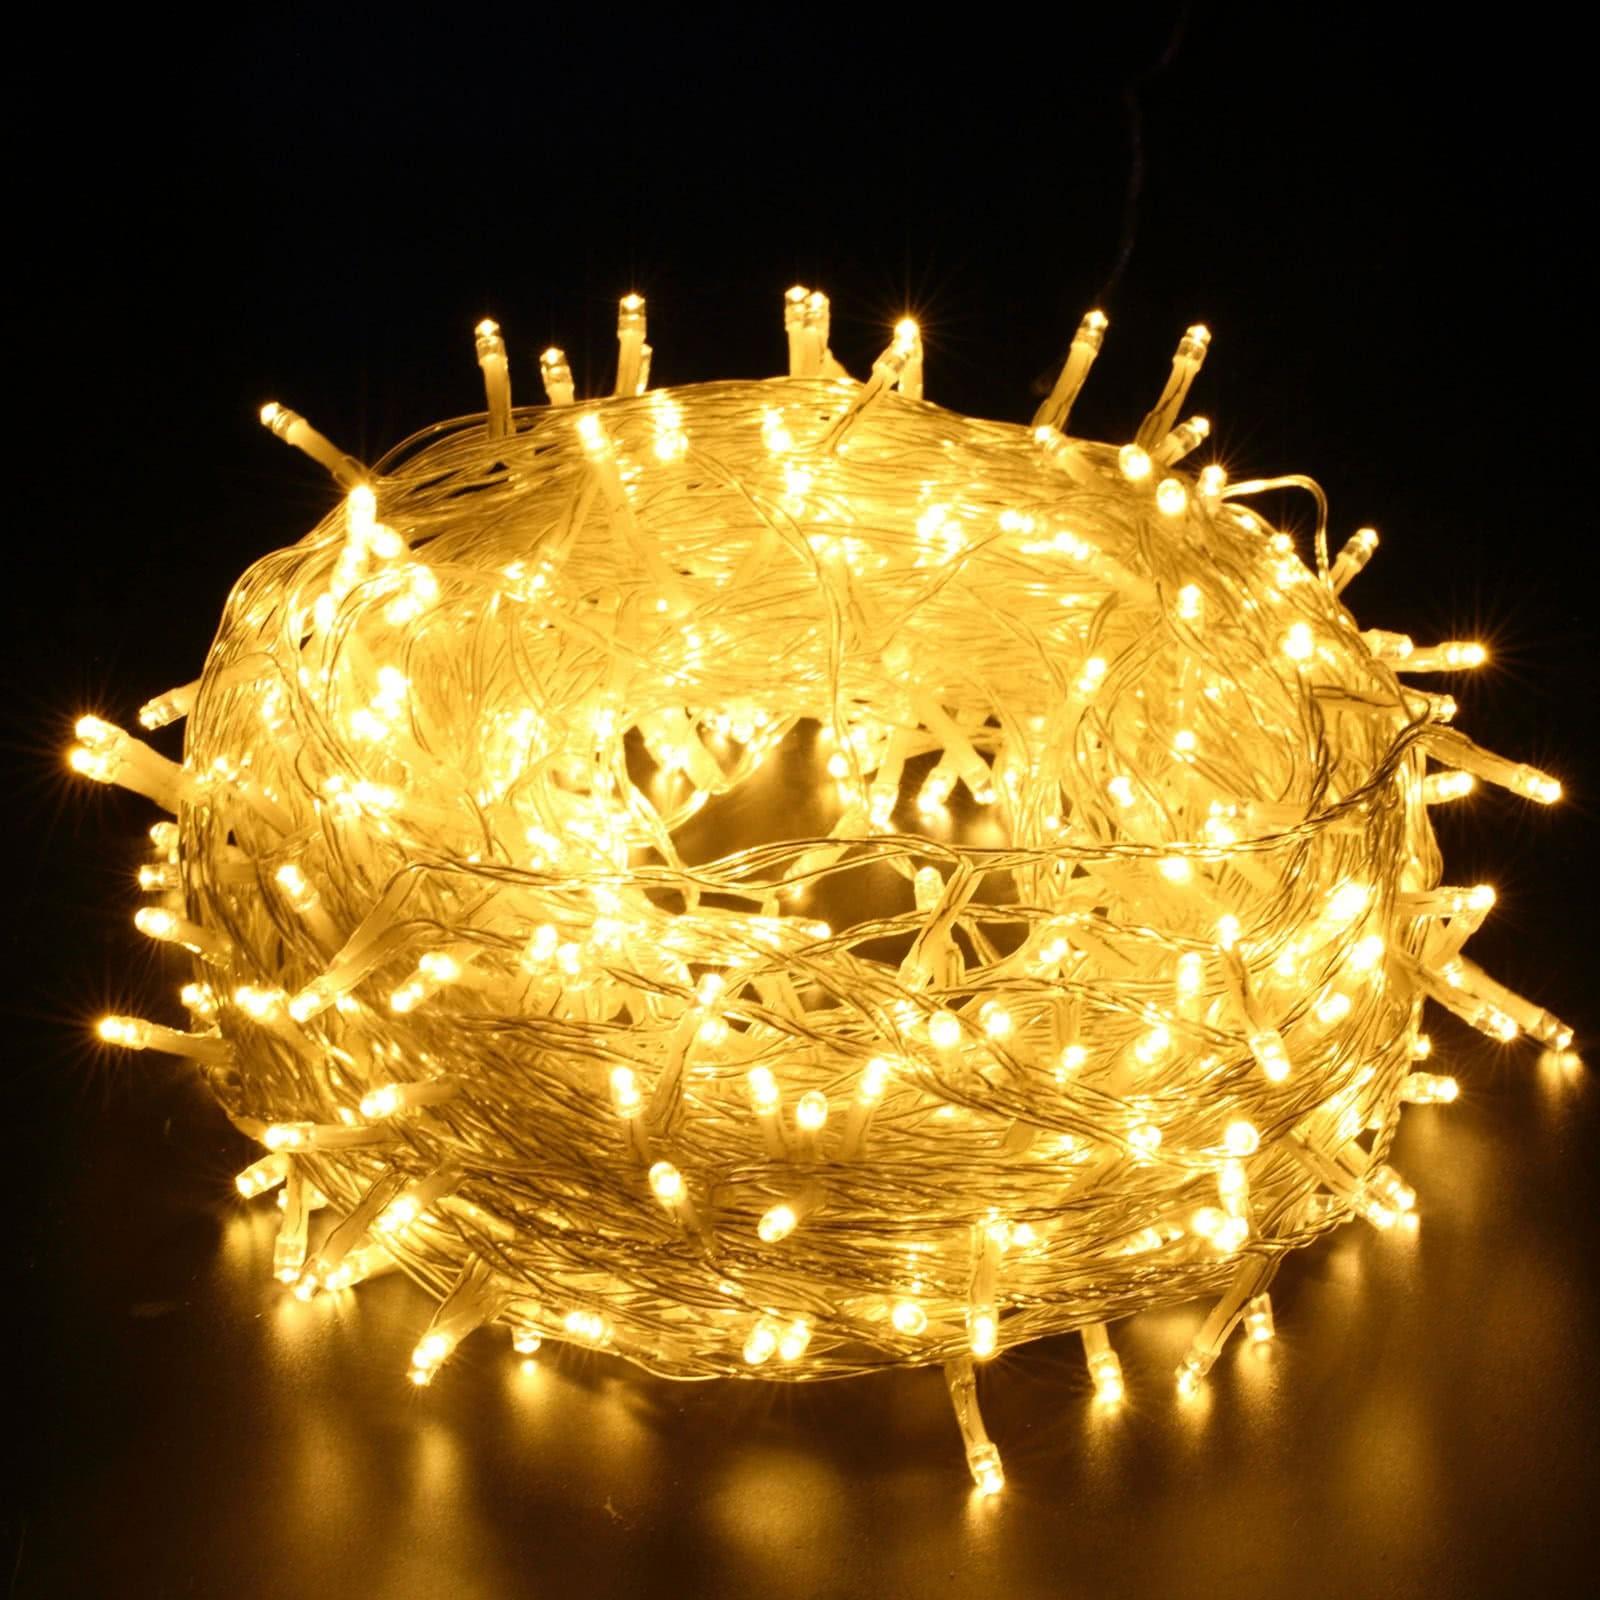 400er Led Lichterkette Warmweiss Yorbay De